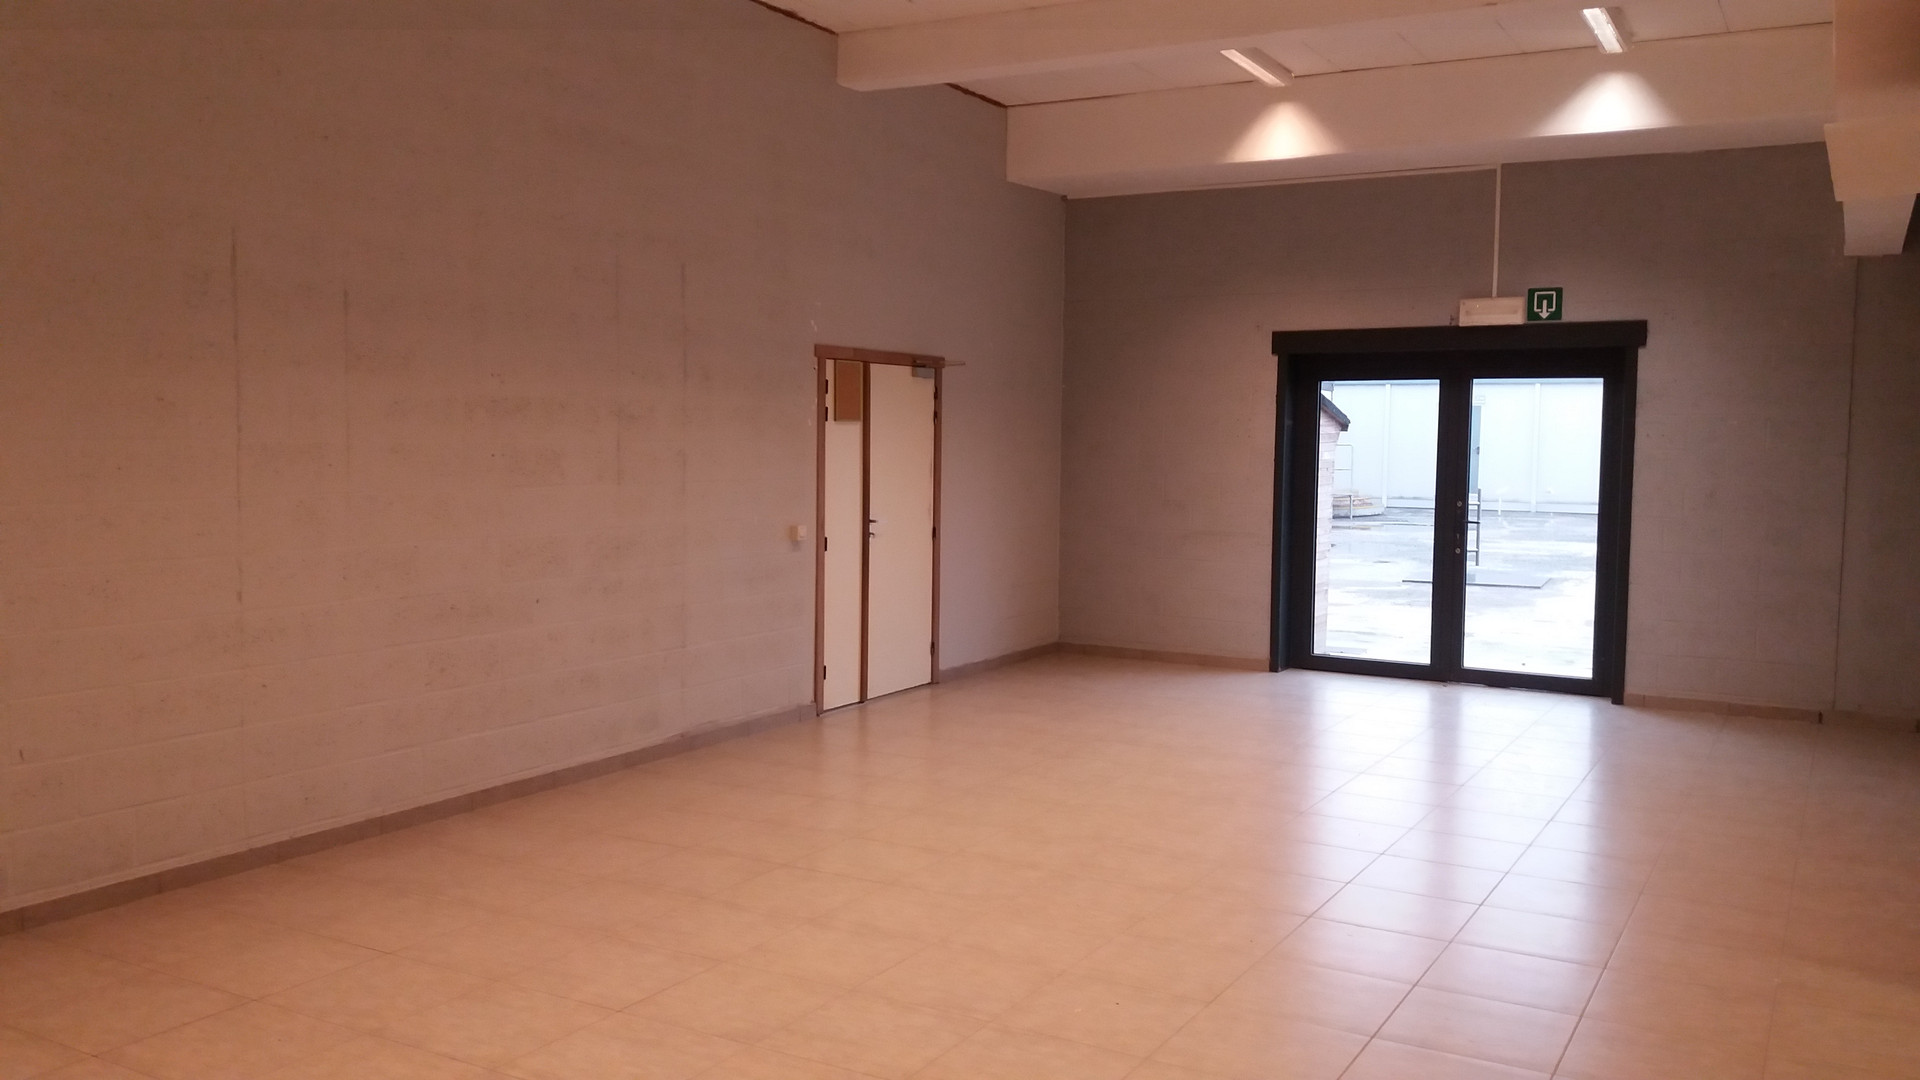 Espace stockage Bureaux STD SA PERONNES LEZ BINCHE